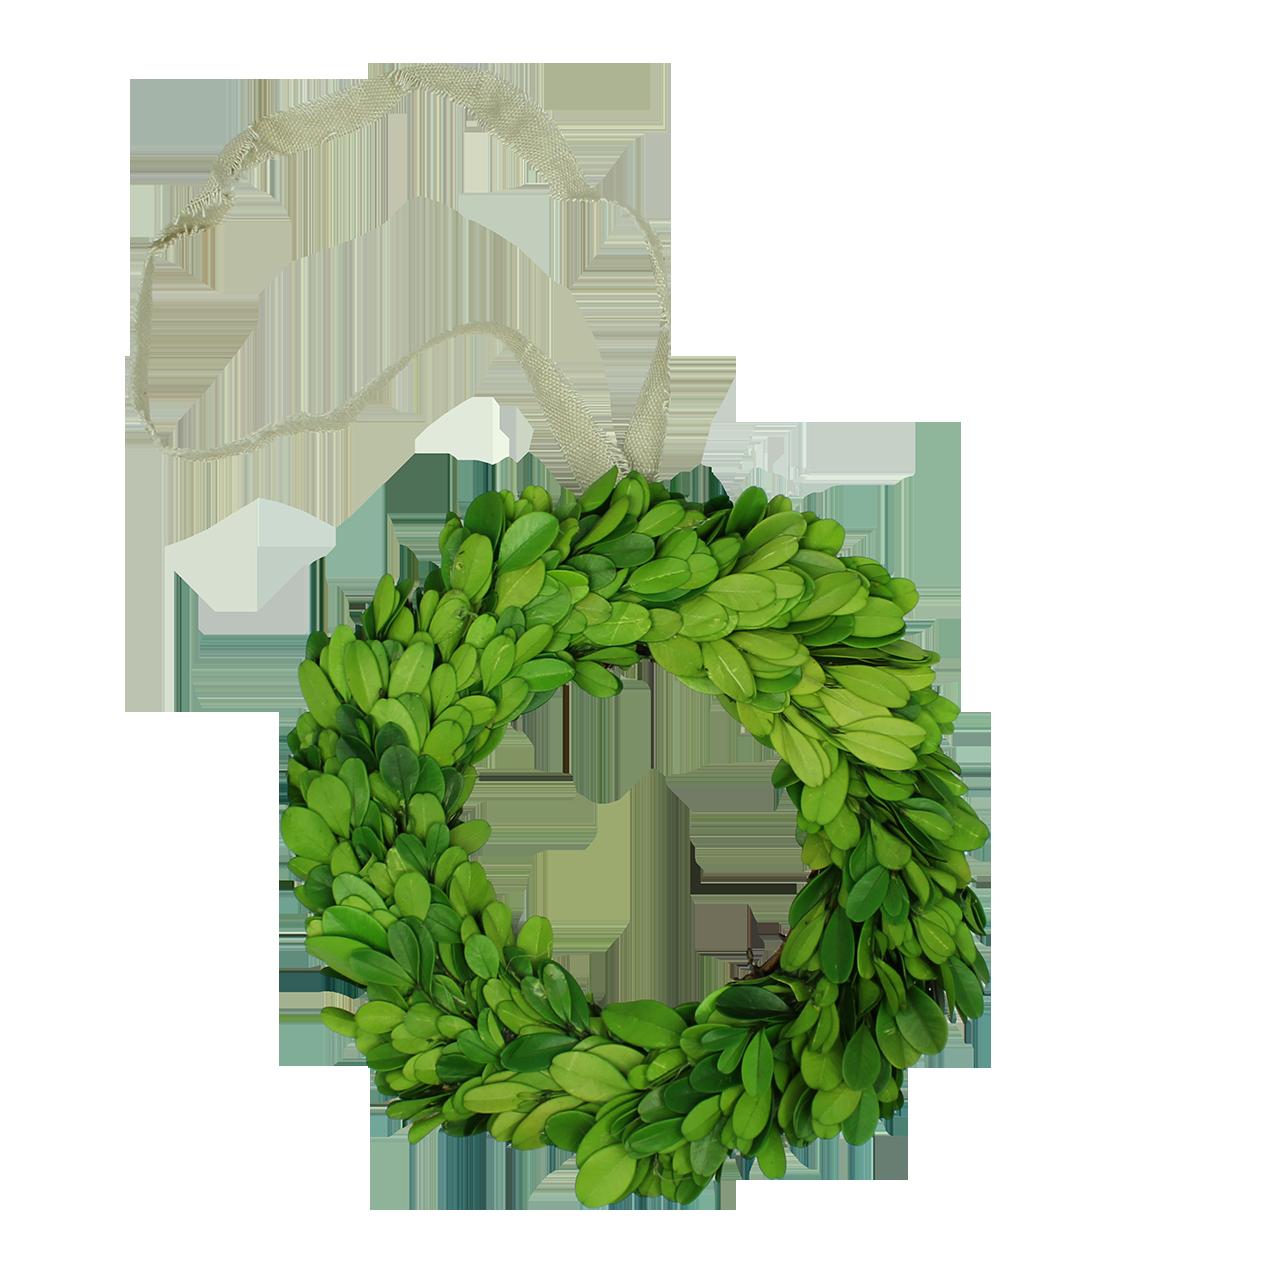 Coronita Decorativa Rotunda Din Buxus Verde 20 Cm